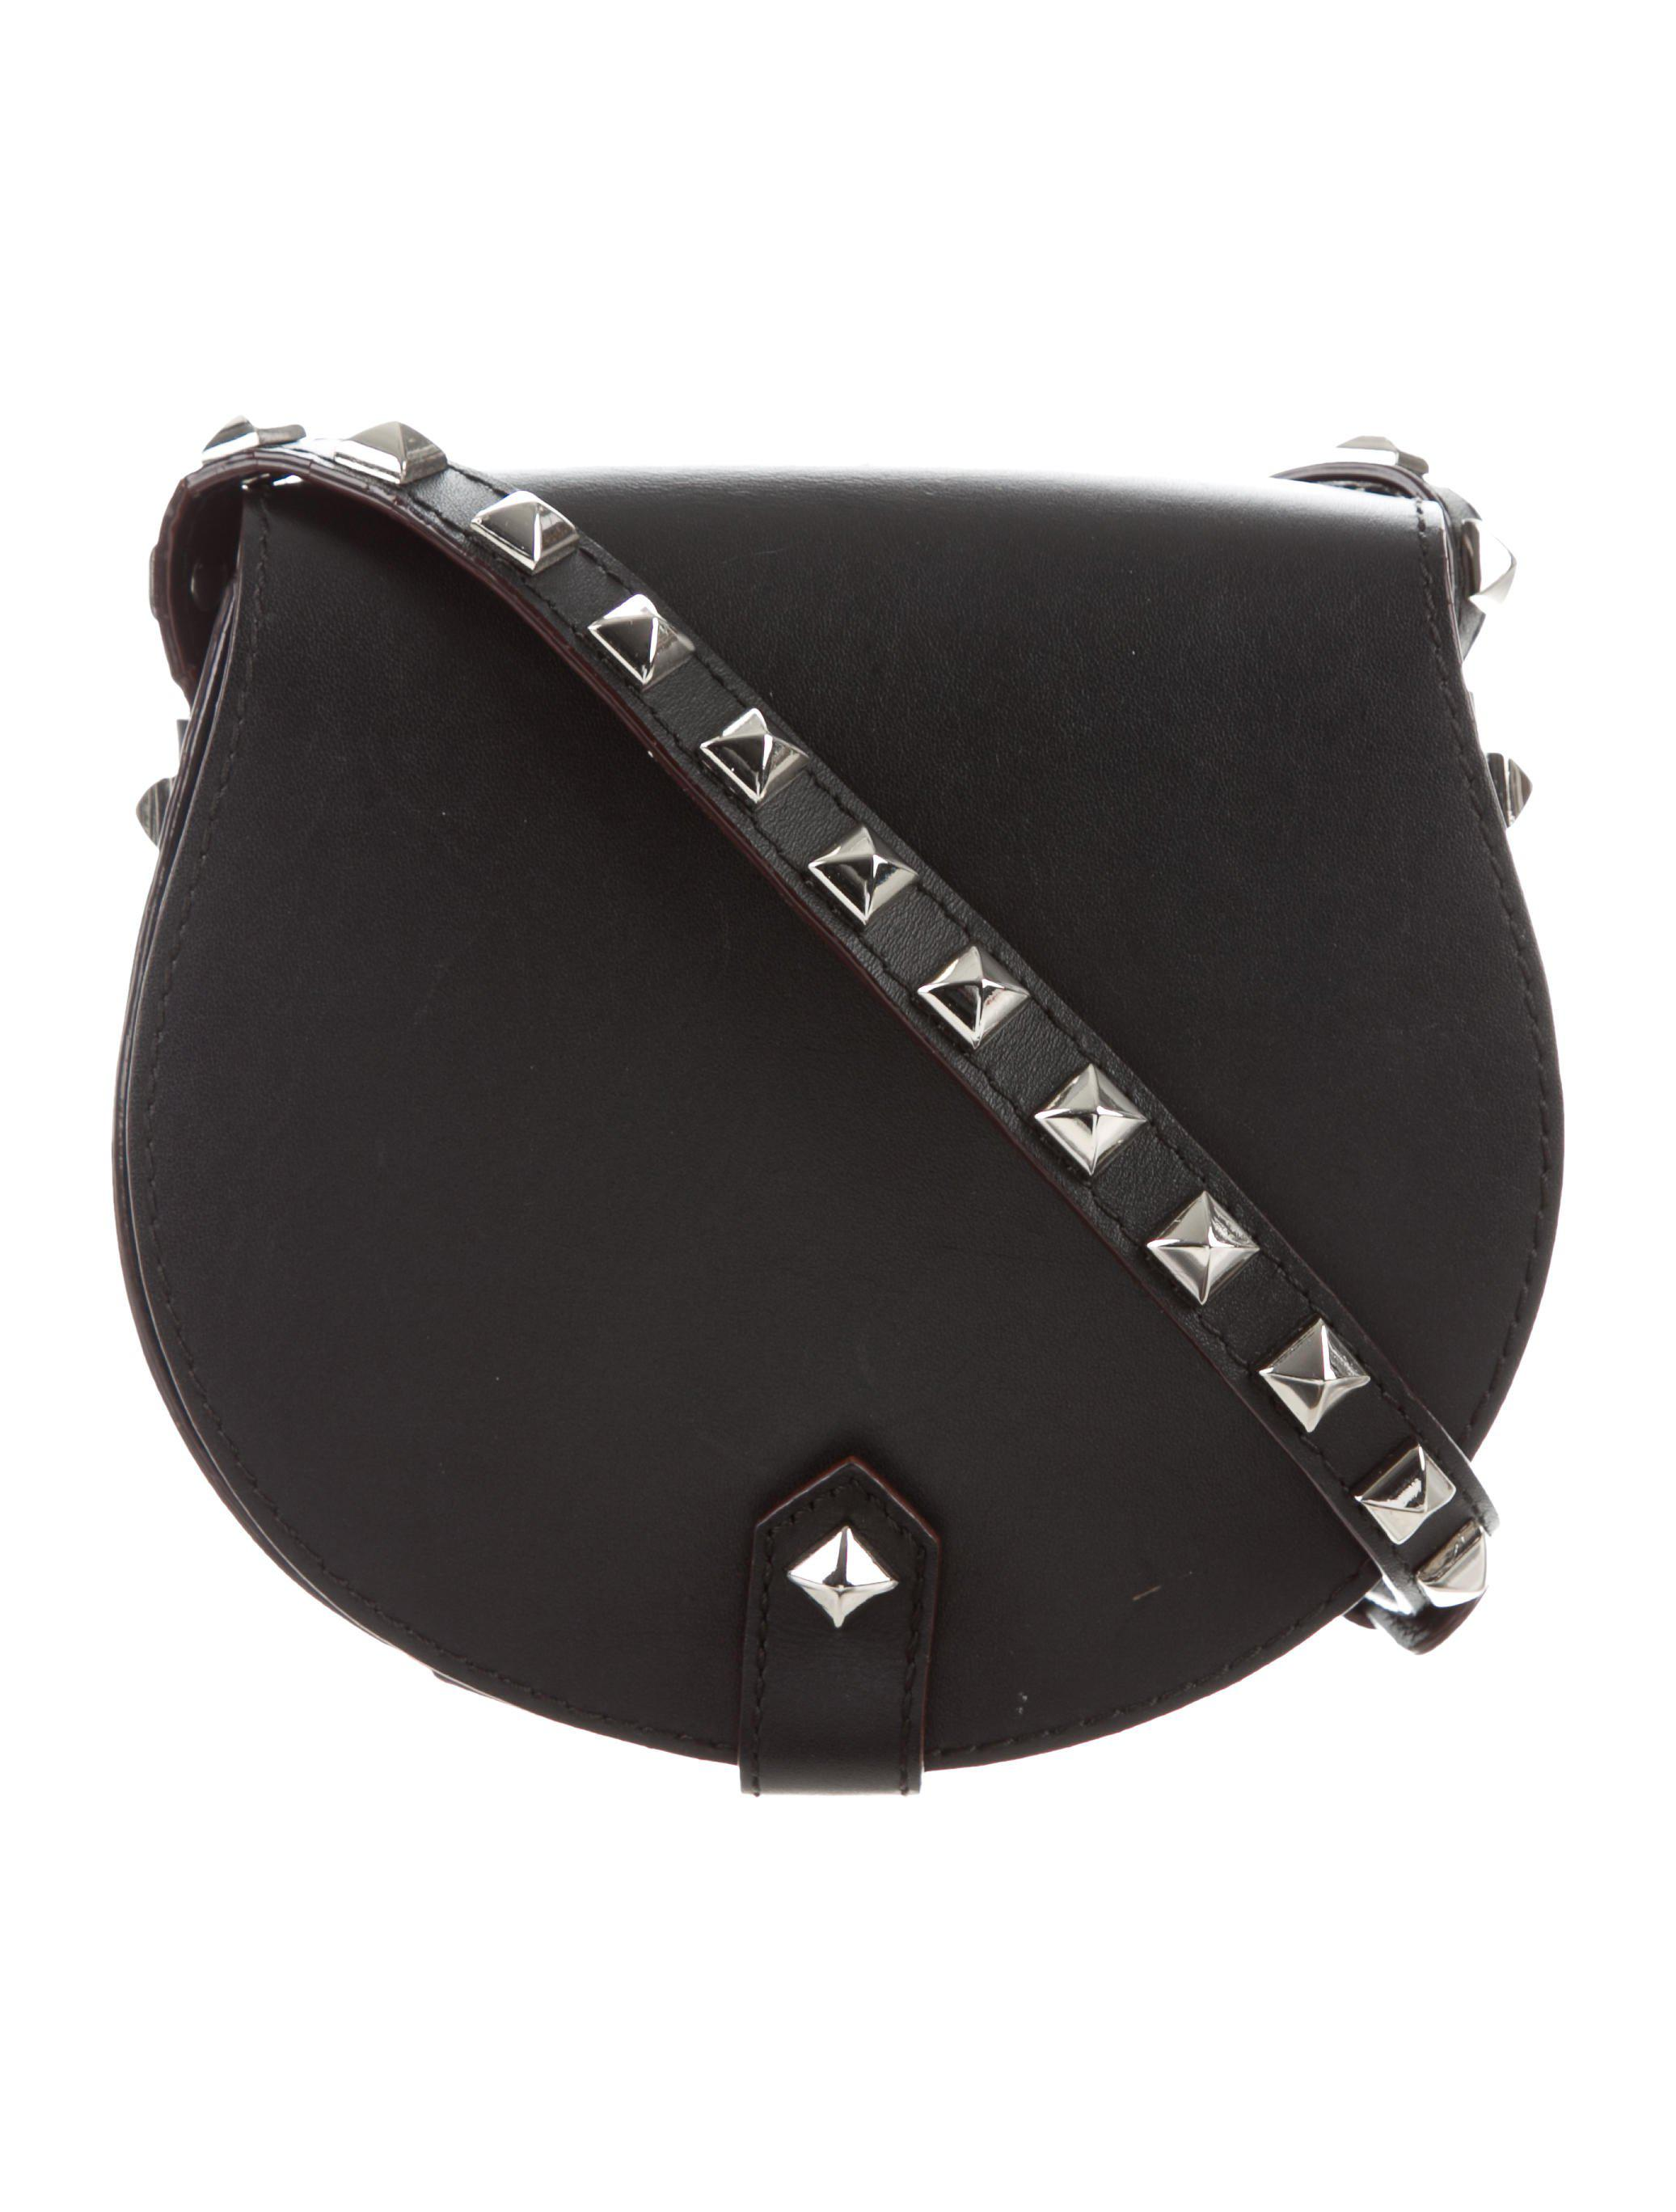 Lyst - Rebecca Minkoff Leather Astor Saddle Bag Black in Metallic 11d8533bfd058